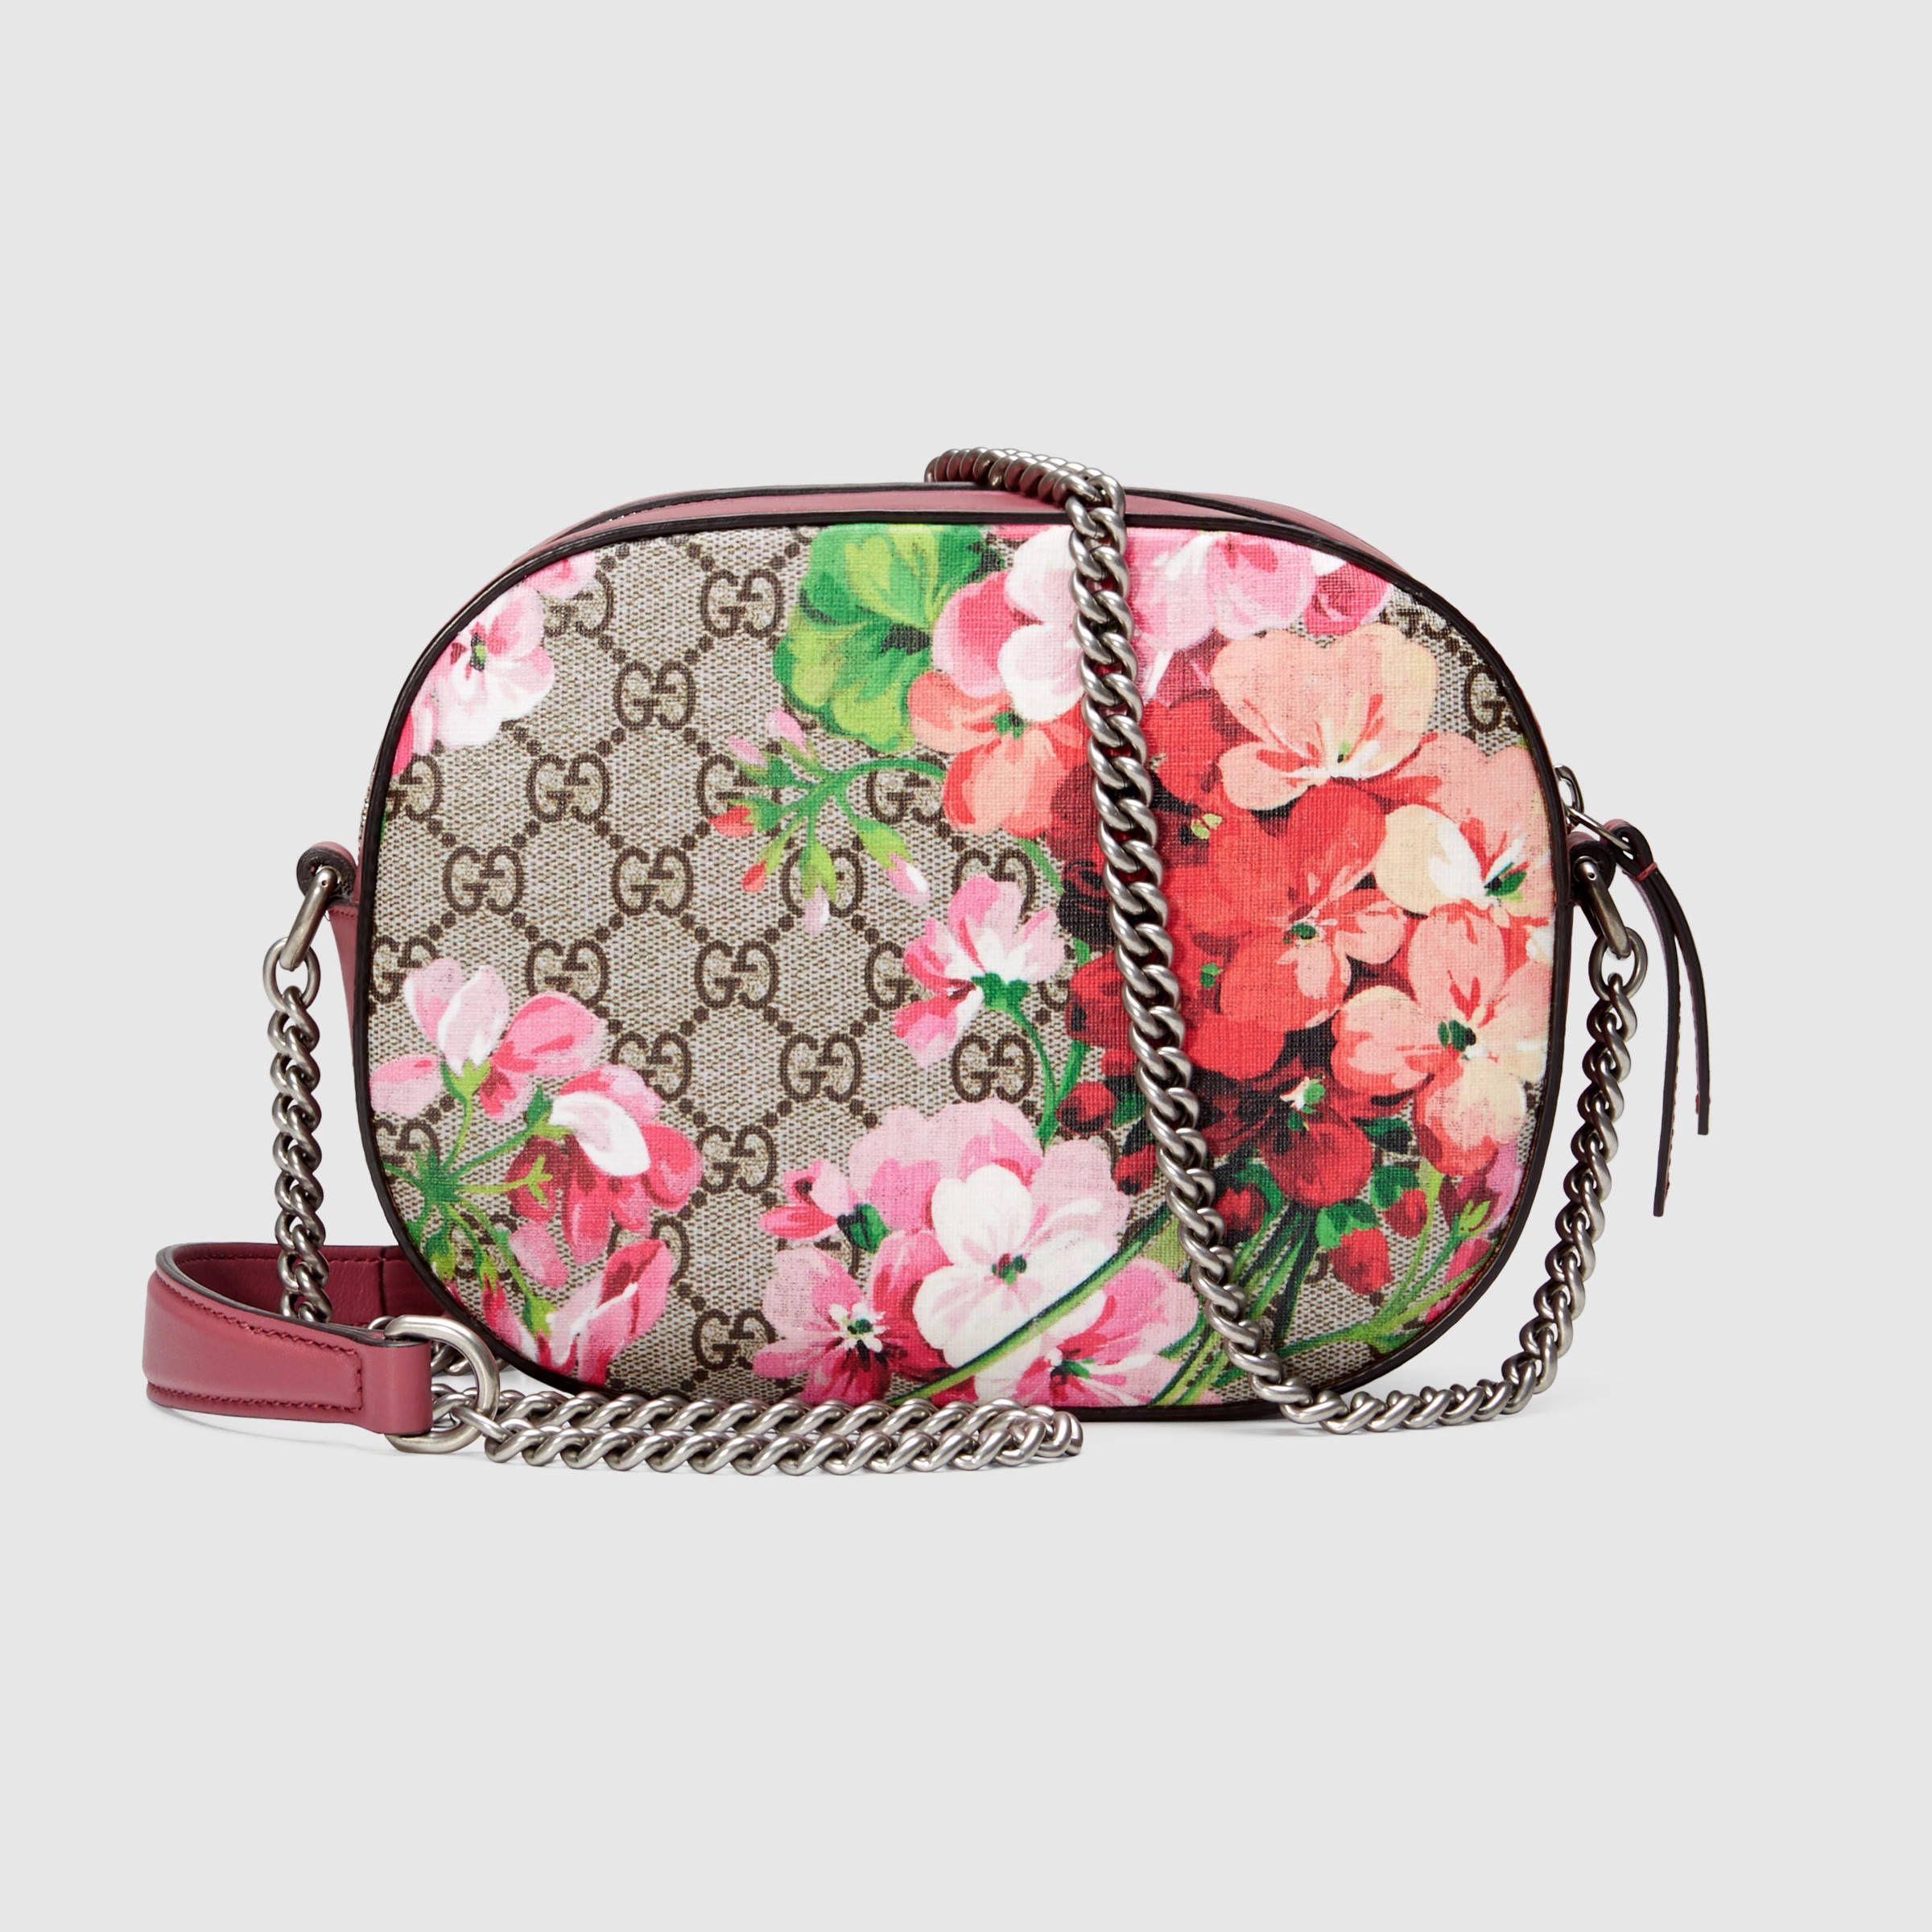 c16bd1bdcbad Gucci Women - Blooms GG Supreme mini chain bag - 409535KU2IN8693 ...